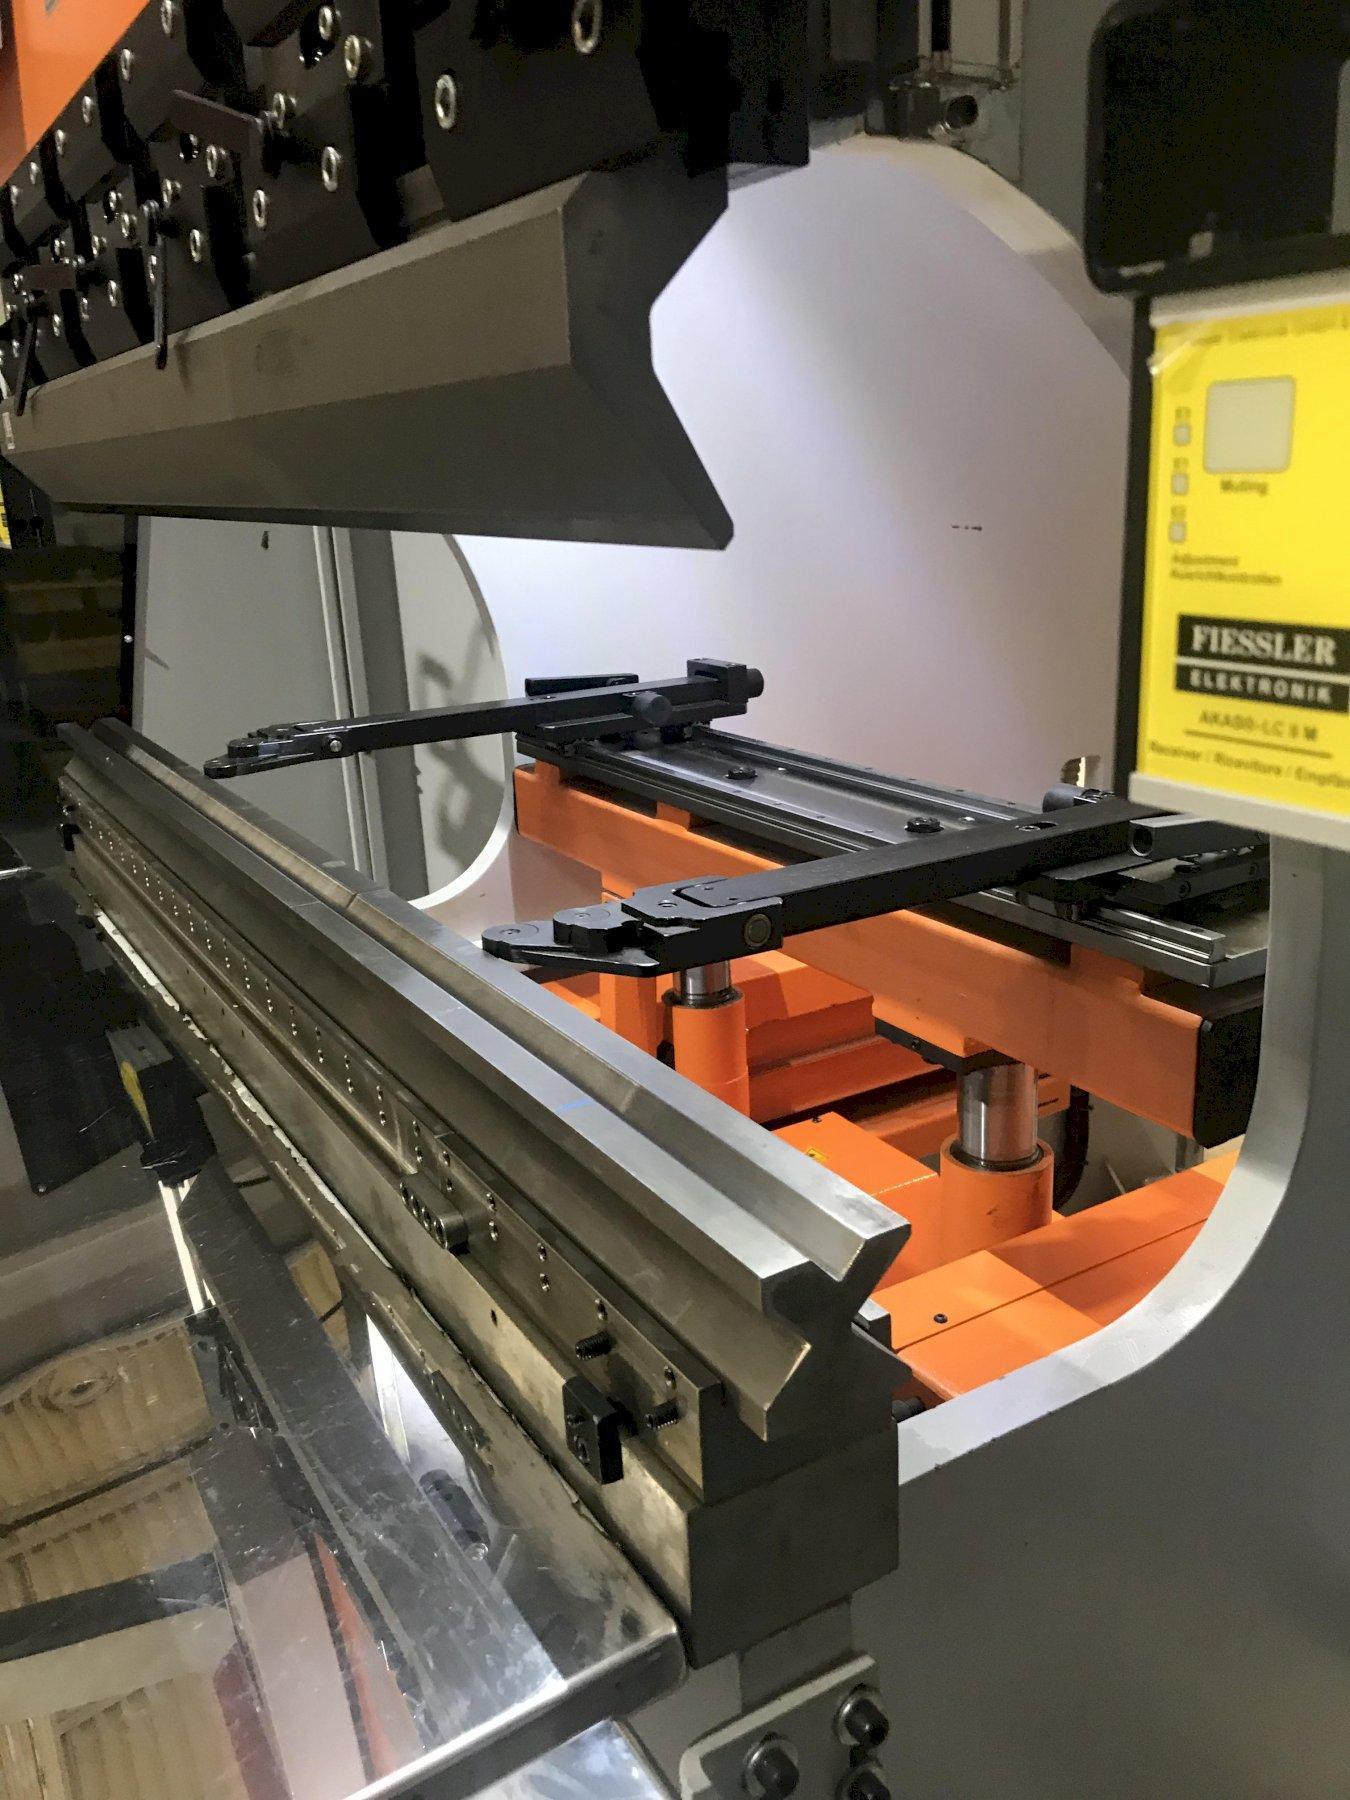 "USED ERMAK MODEL POWER BEND PRO 50"" X 66 TON HYDRAULIC CNC PRESS BRAKE, Year 2017, Stock # 10719"